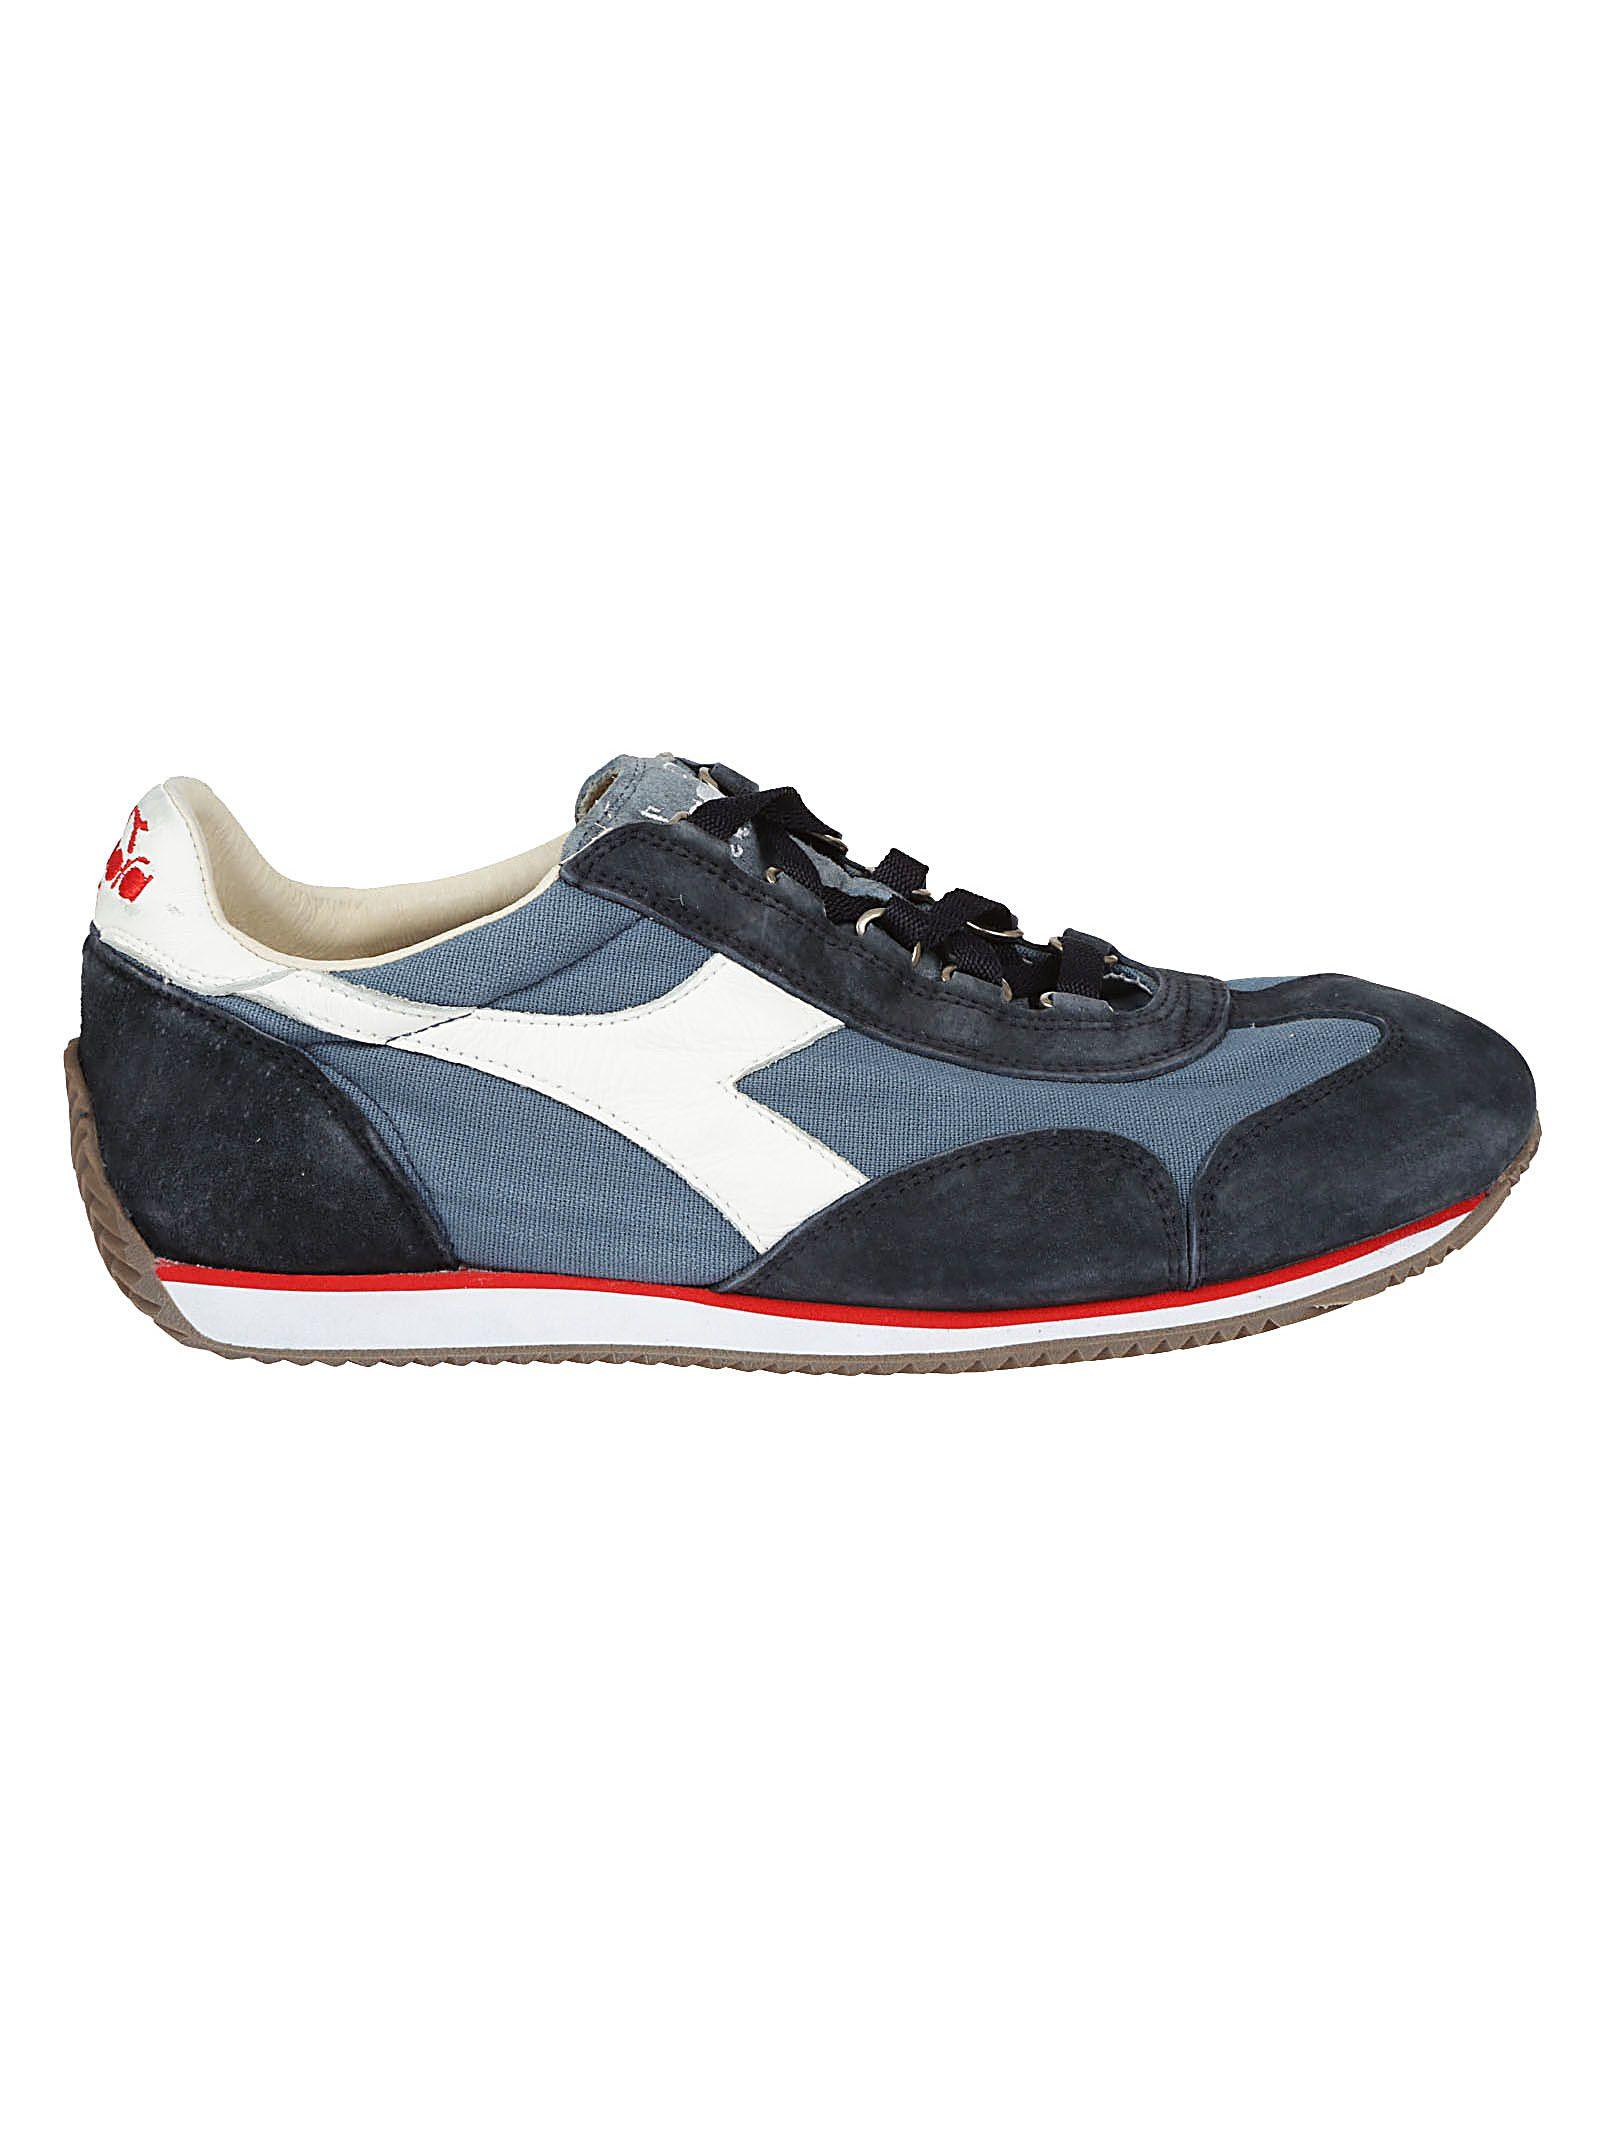 Diadora Equipe Stone Wash Sneakers